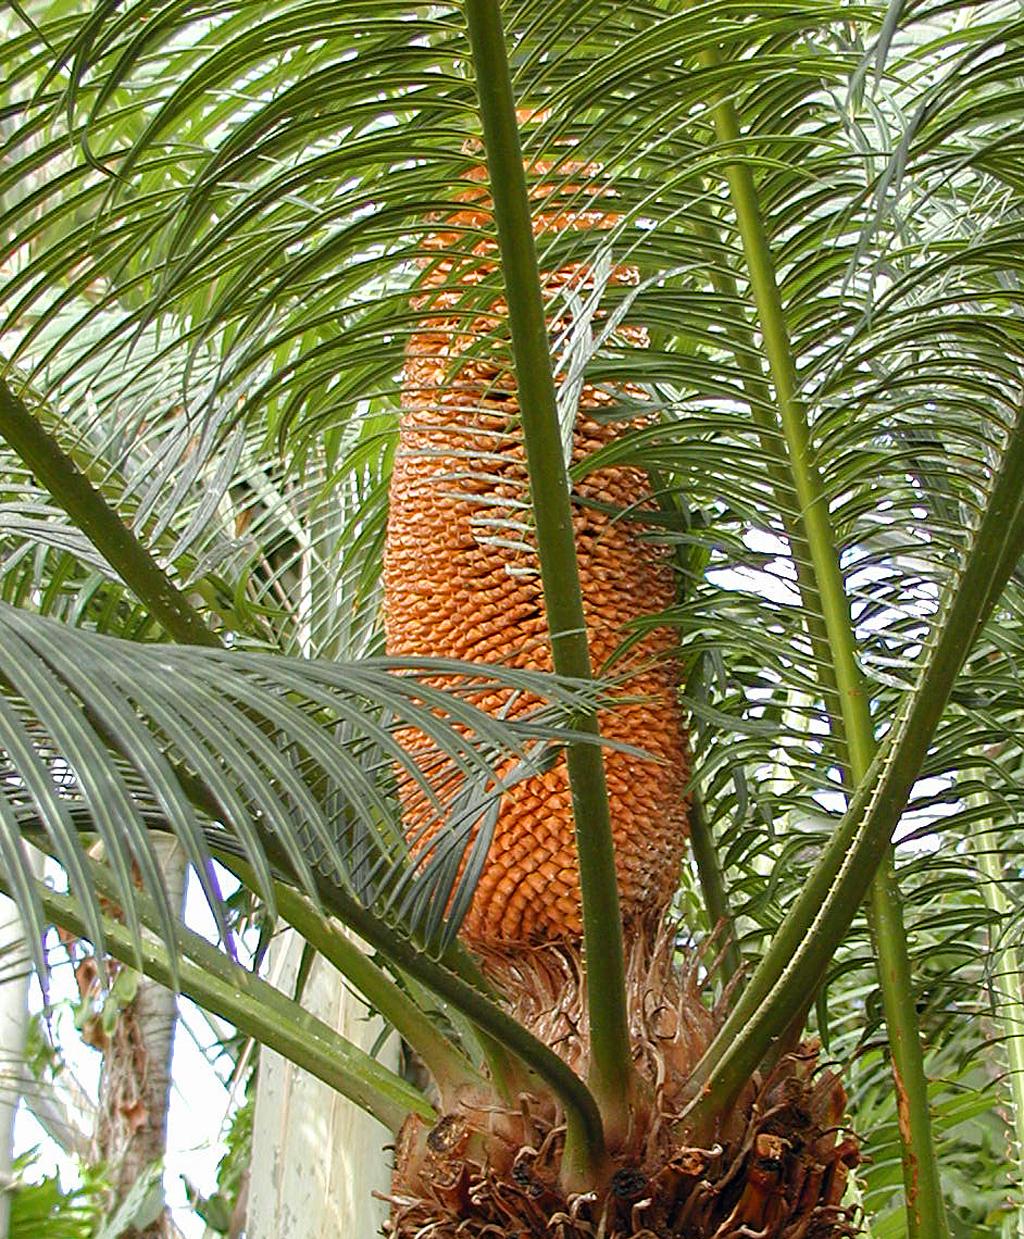 kopenhamns_botaniska_tgd_palm_1024x1239